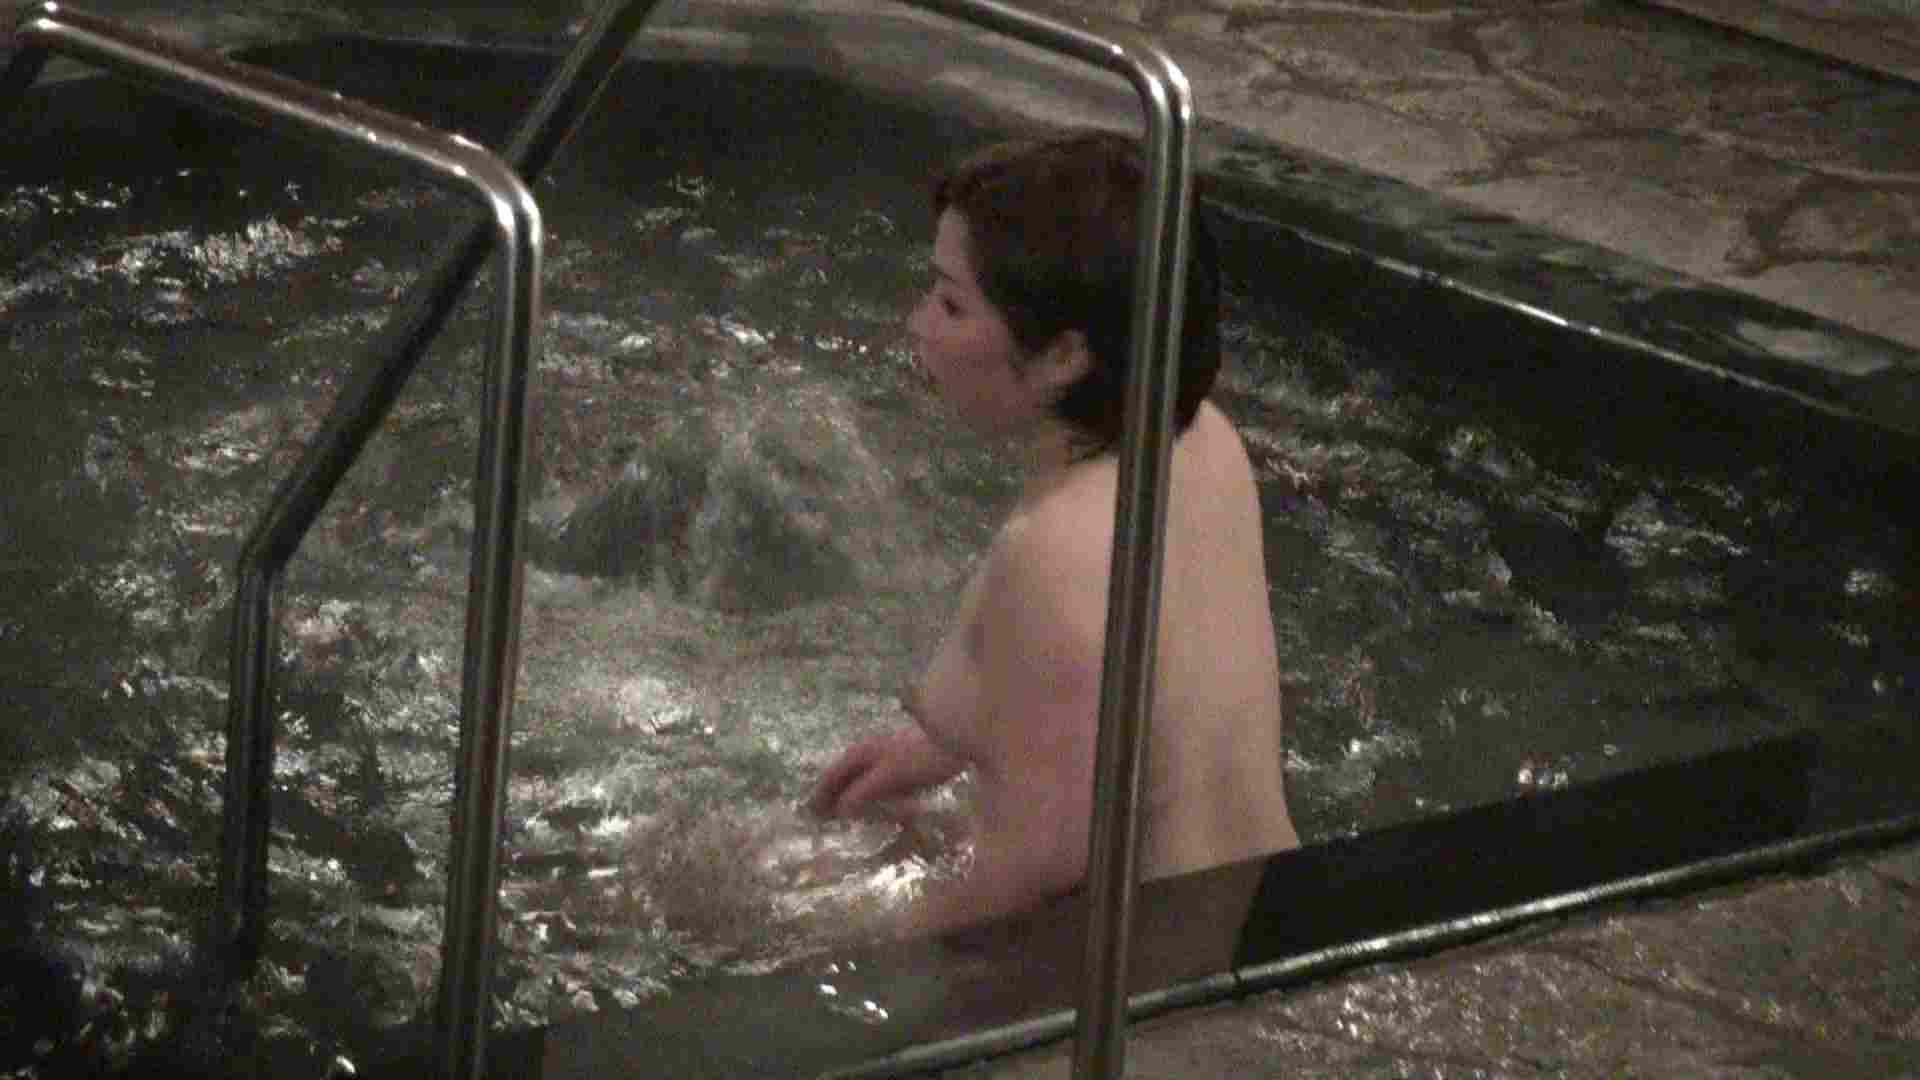 Aquaな露天風呂Vol.432 露天風呂 | OLのエロ生活  73連発 52